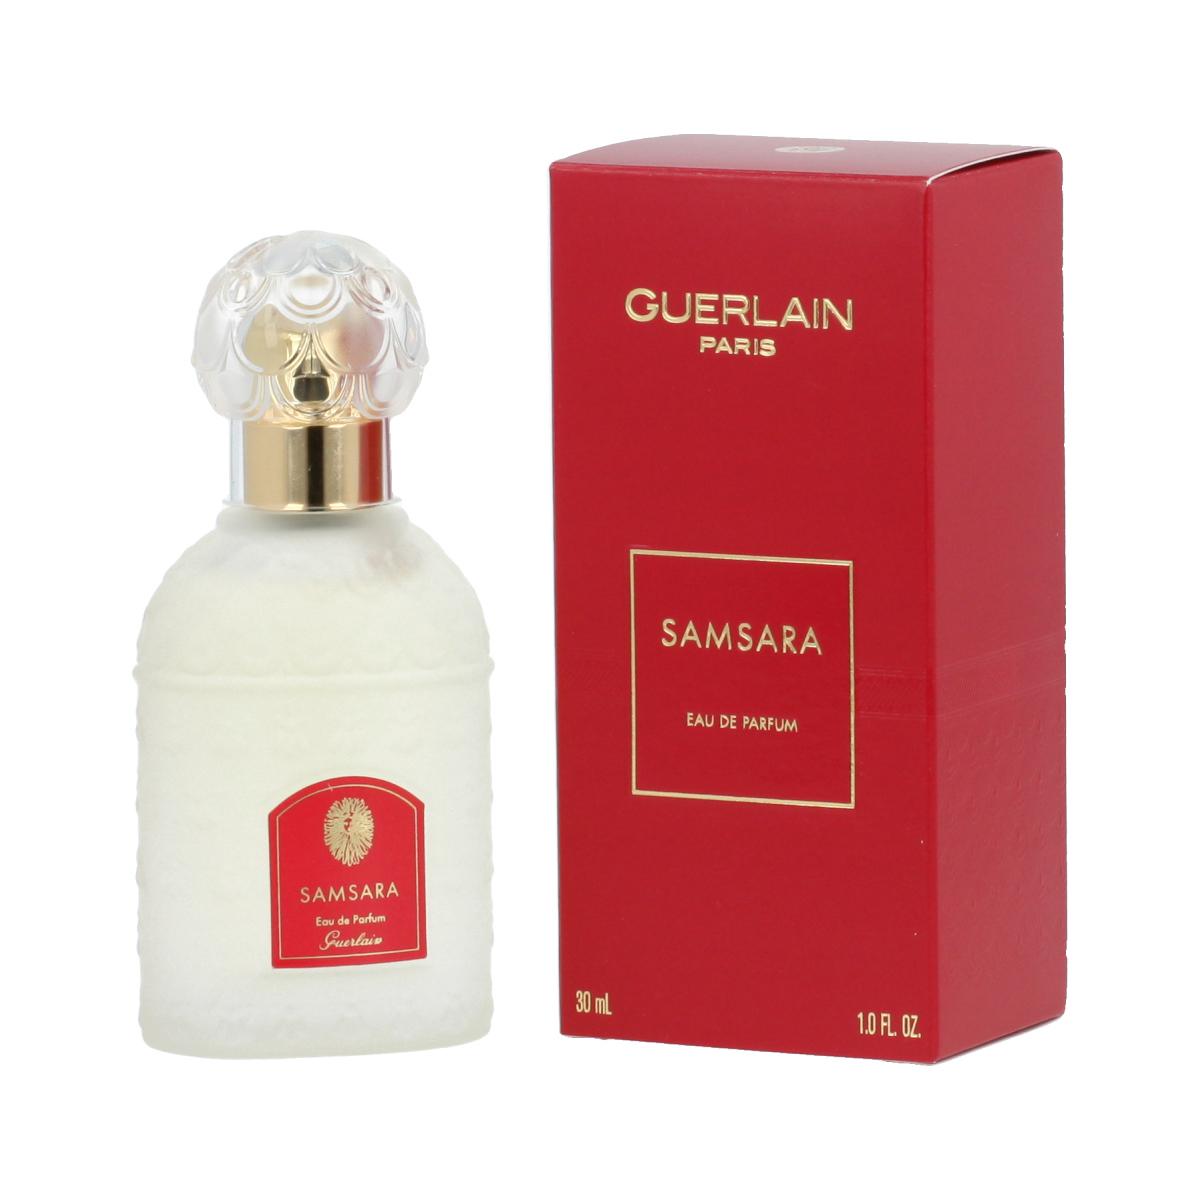 Guerlain Samsara Eau De Parfum 30 ml (woman) 15831